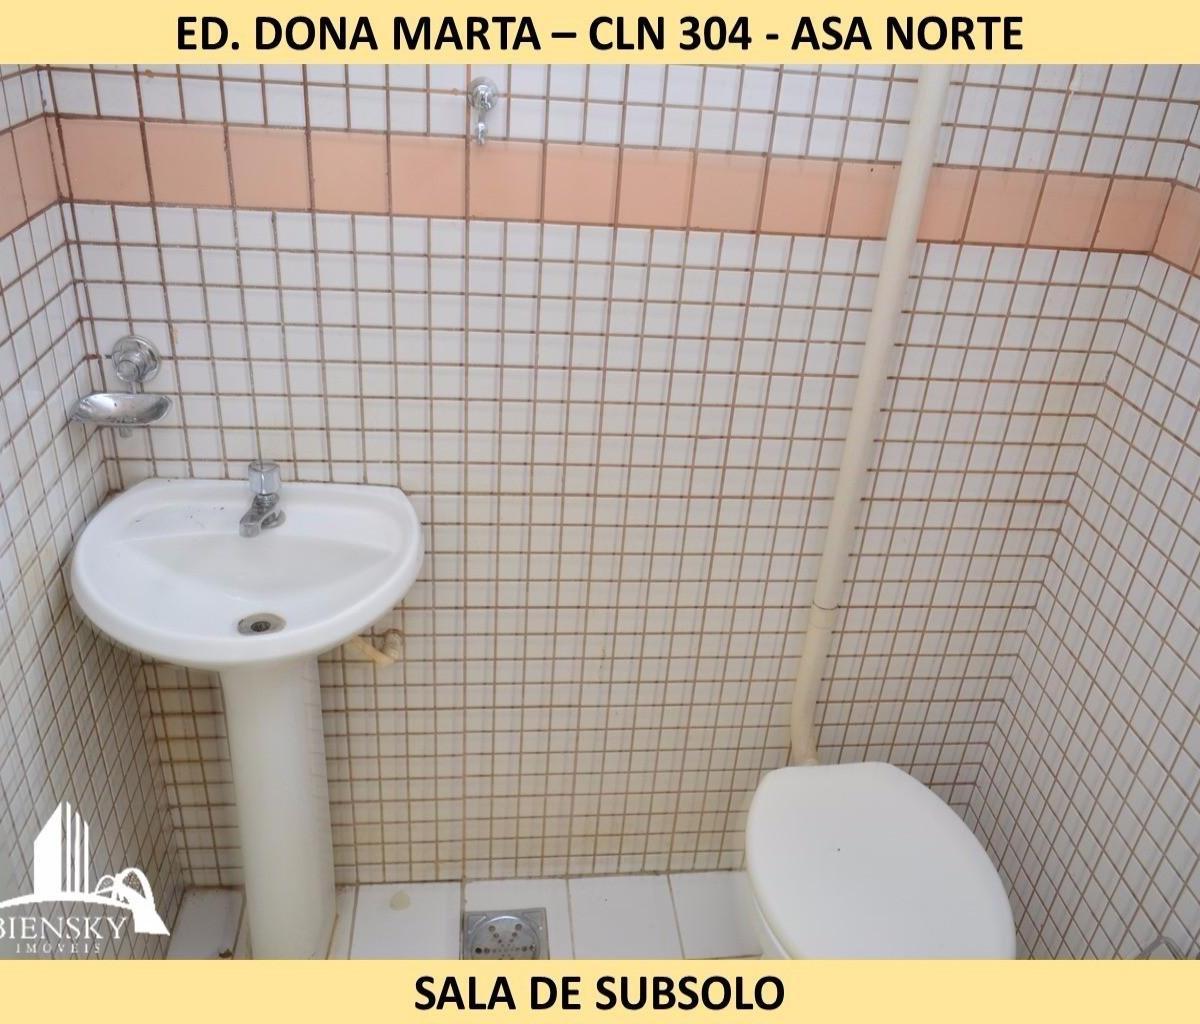 Imagens de #9F812C cln 304 bloco d loja de subsolo cln 304 bloco d asa norte brasília 1200x1024 px 3346 Bloco De Cad Banheiro Publico